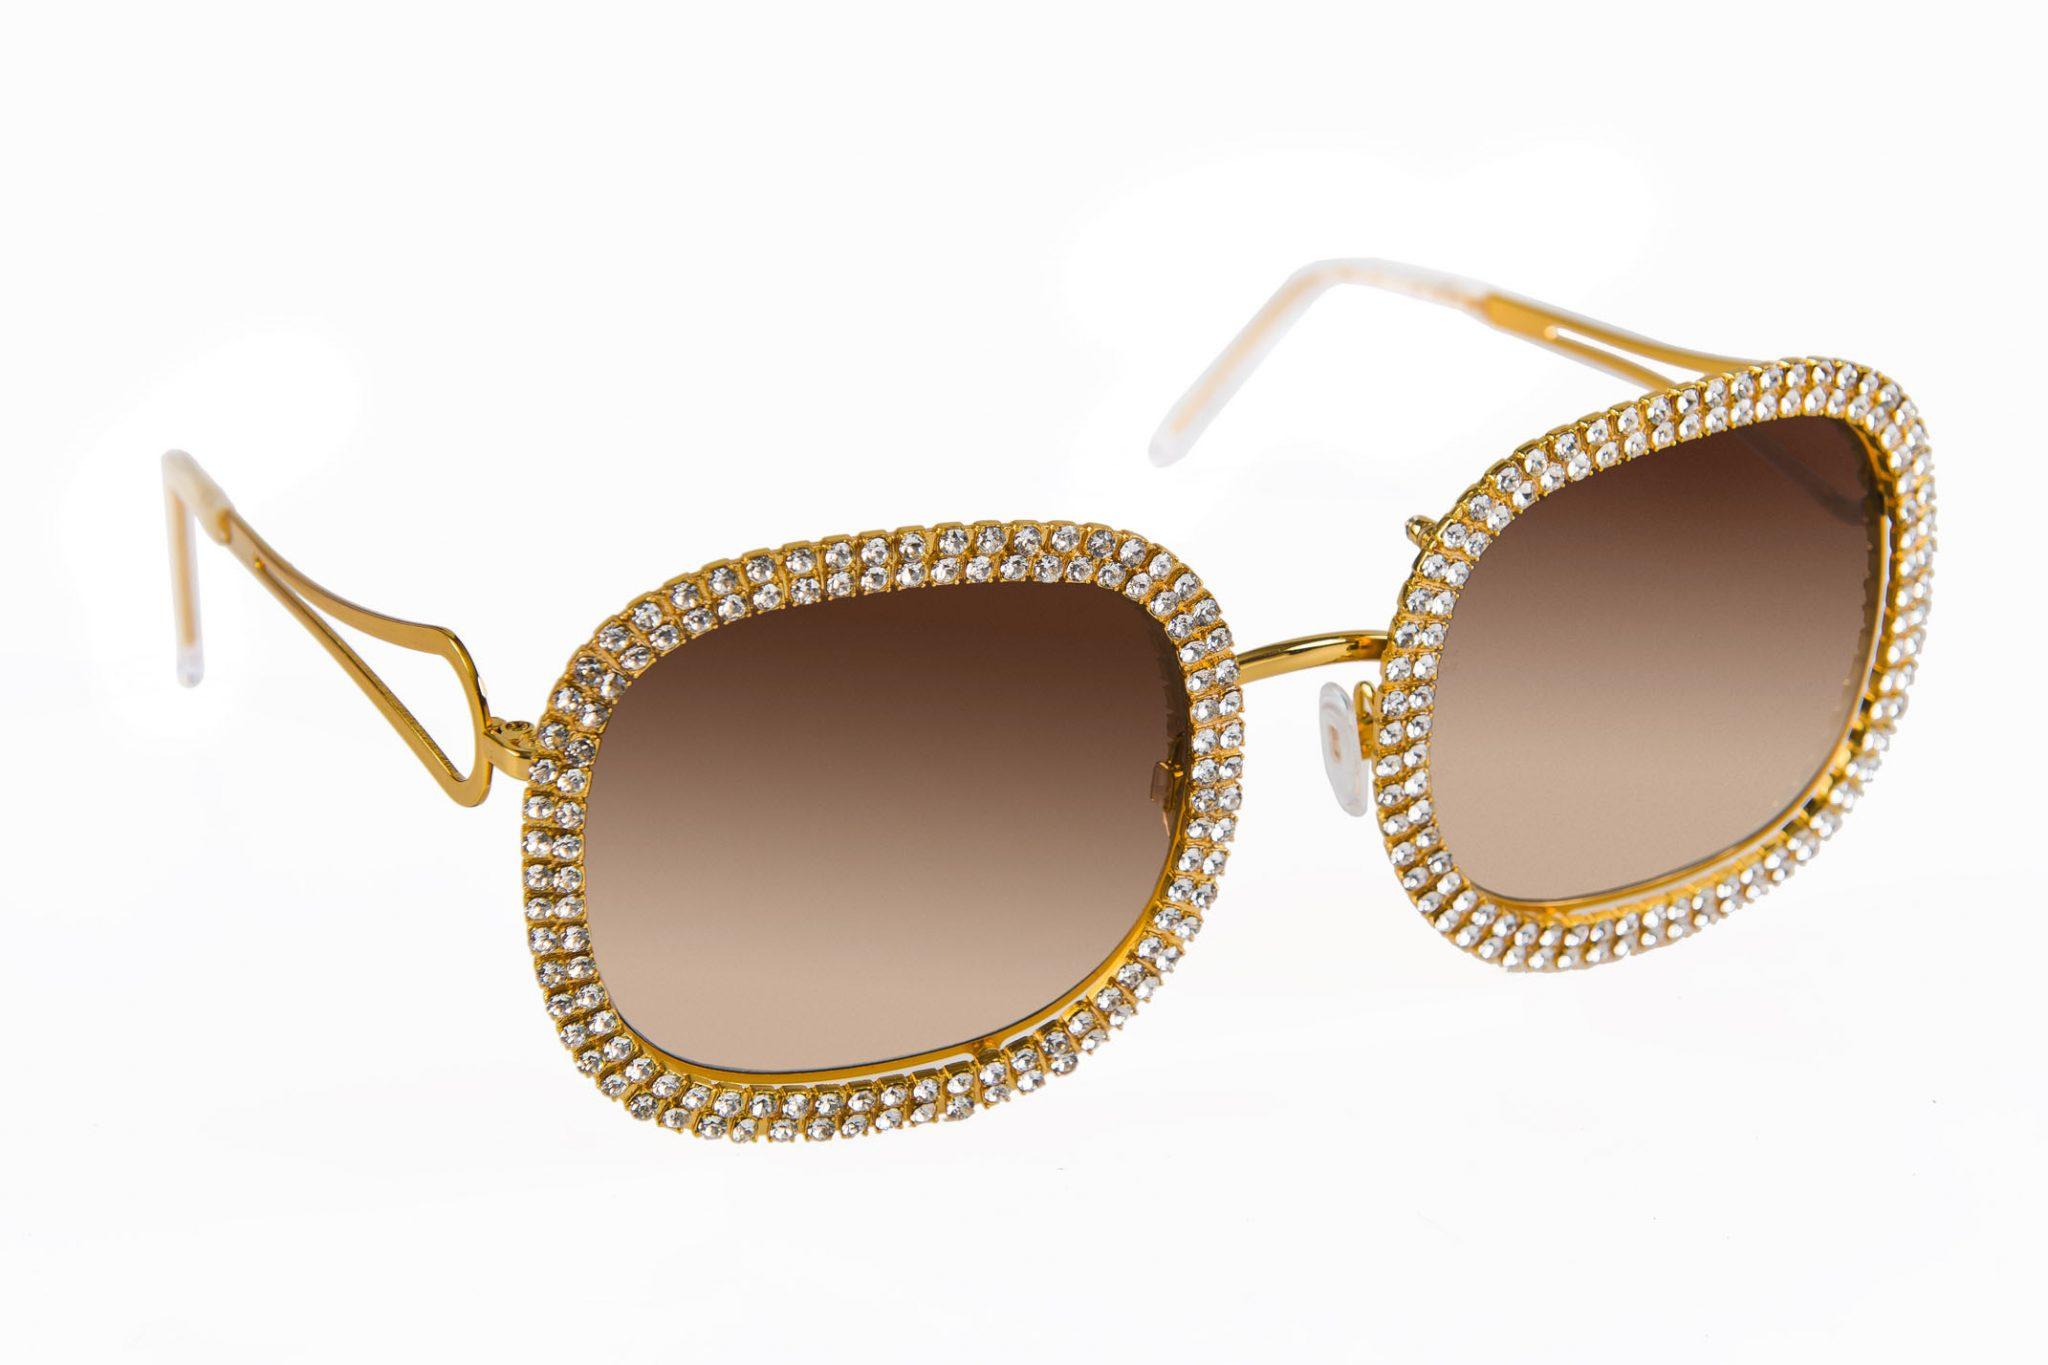 Tura sunglasses